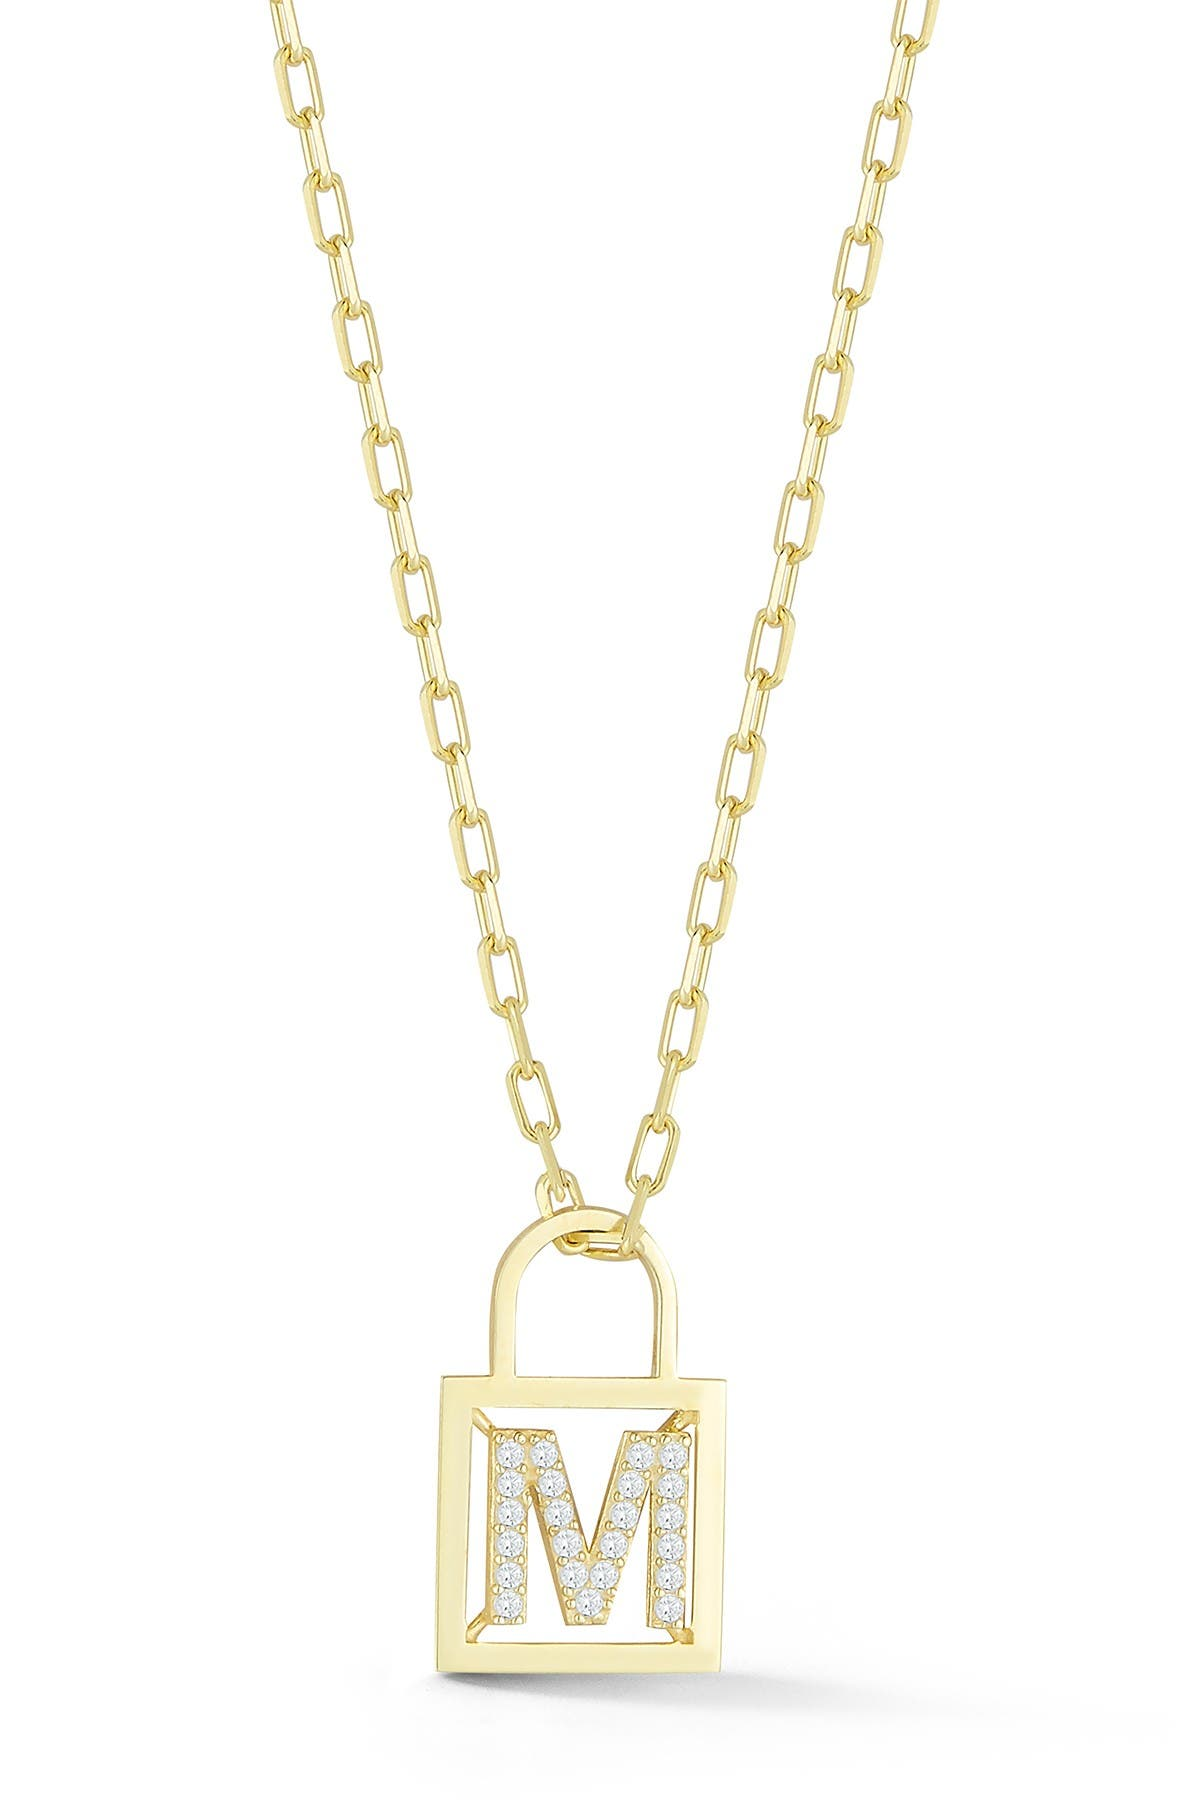 Image of Sphera Milano Gold Vermeil Padlock Necklace